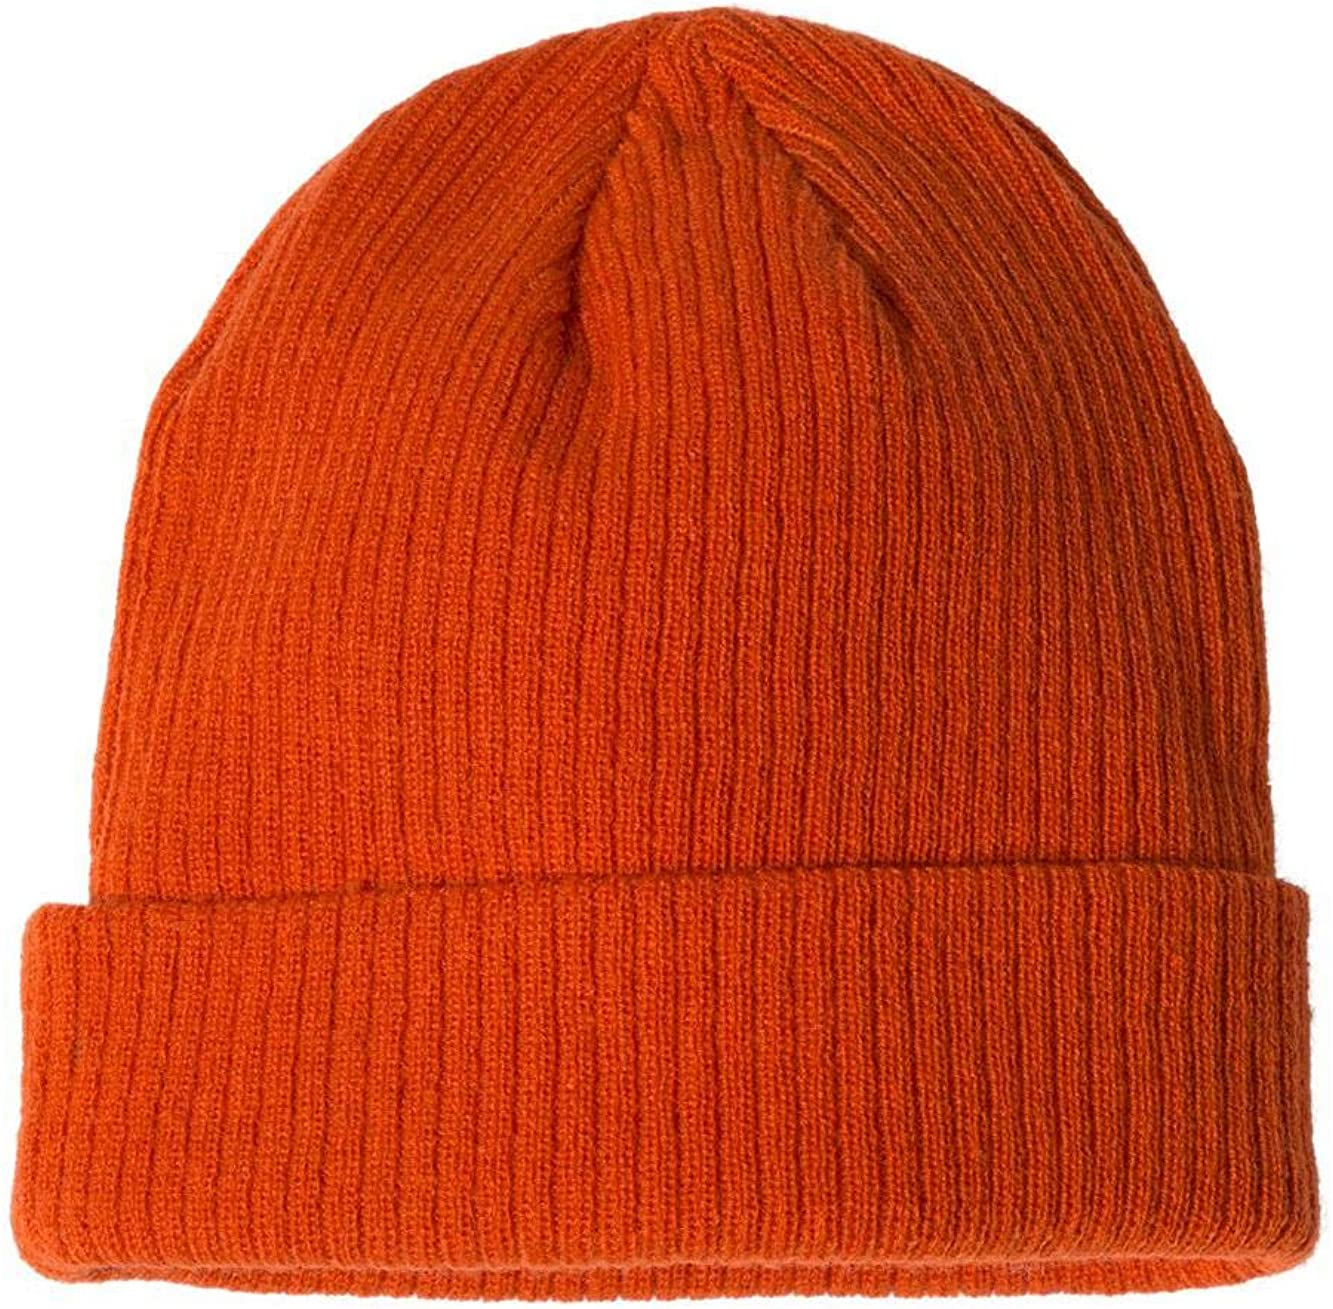 CS4003 Spicy Orange Ribbed Knit Cap One Size Champion